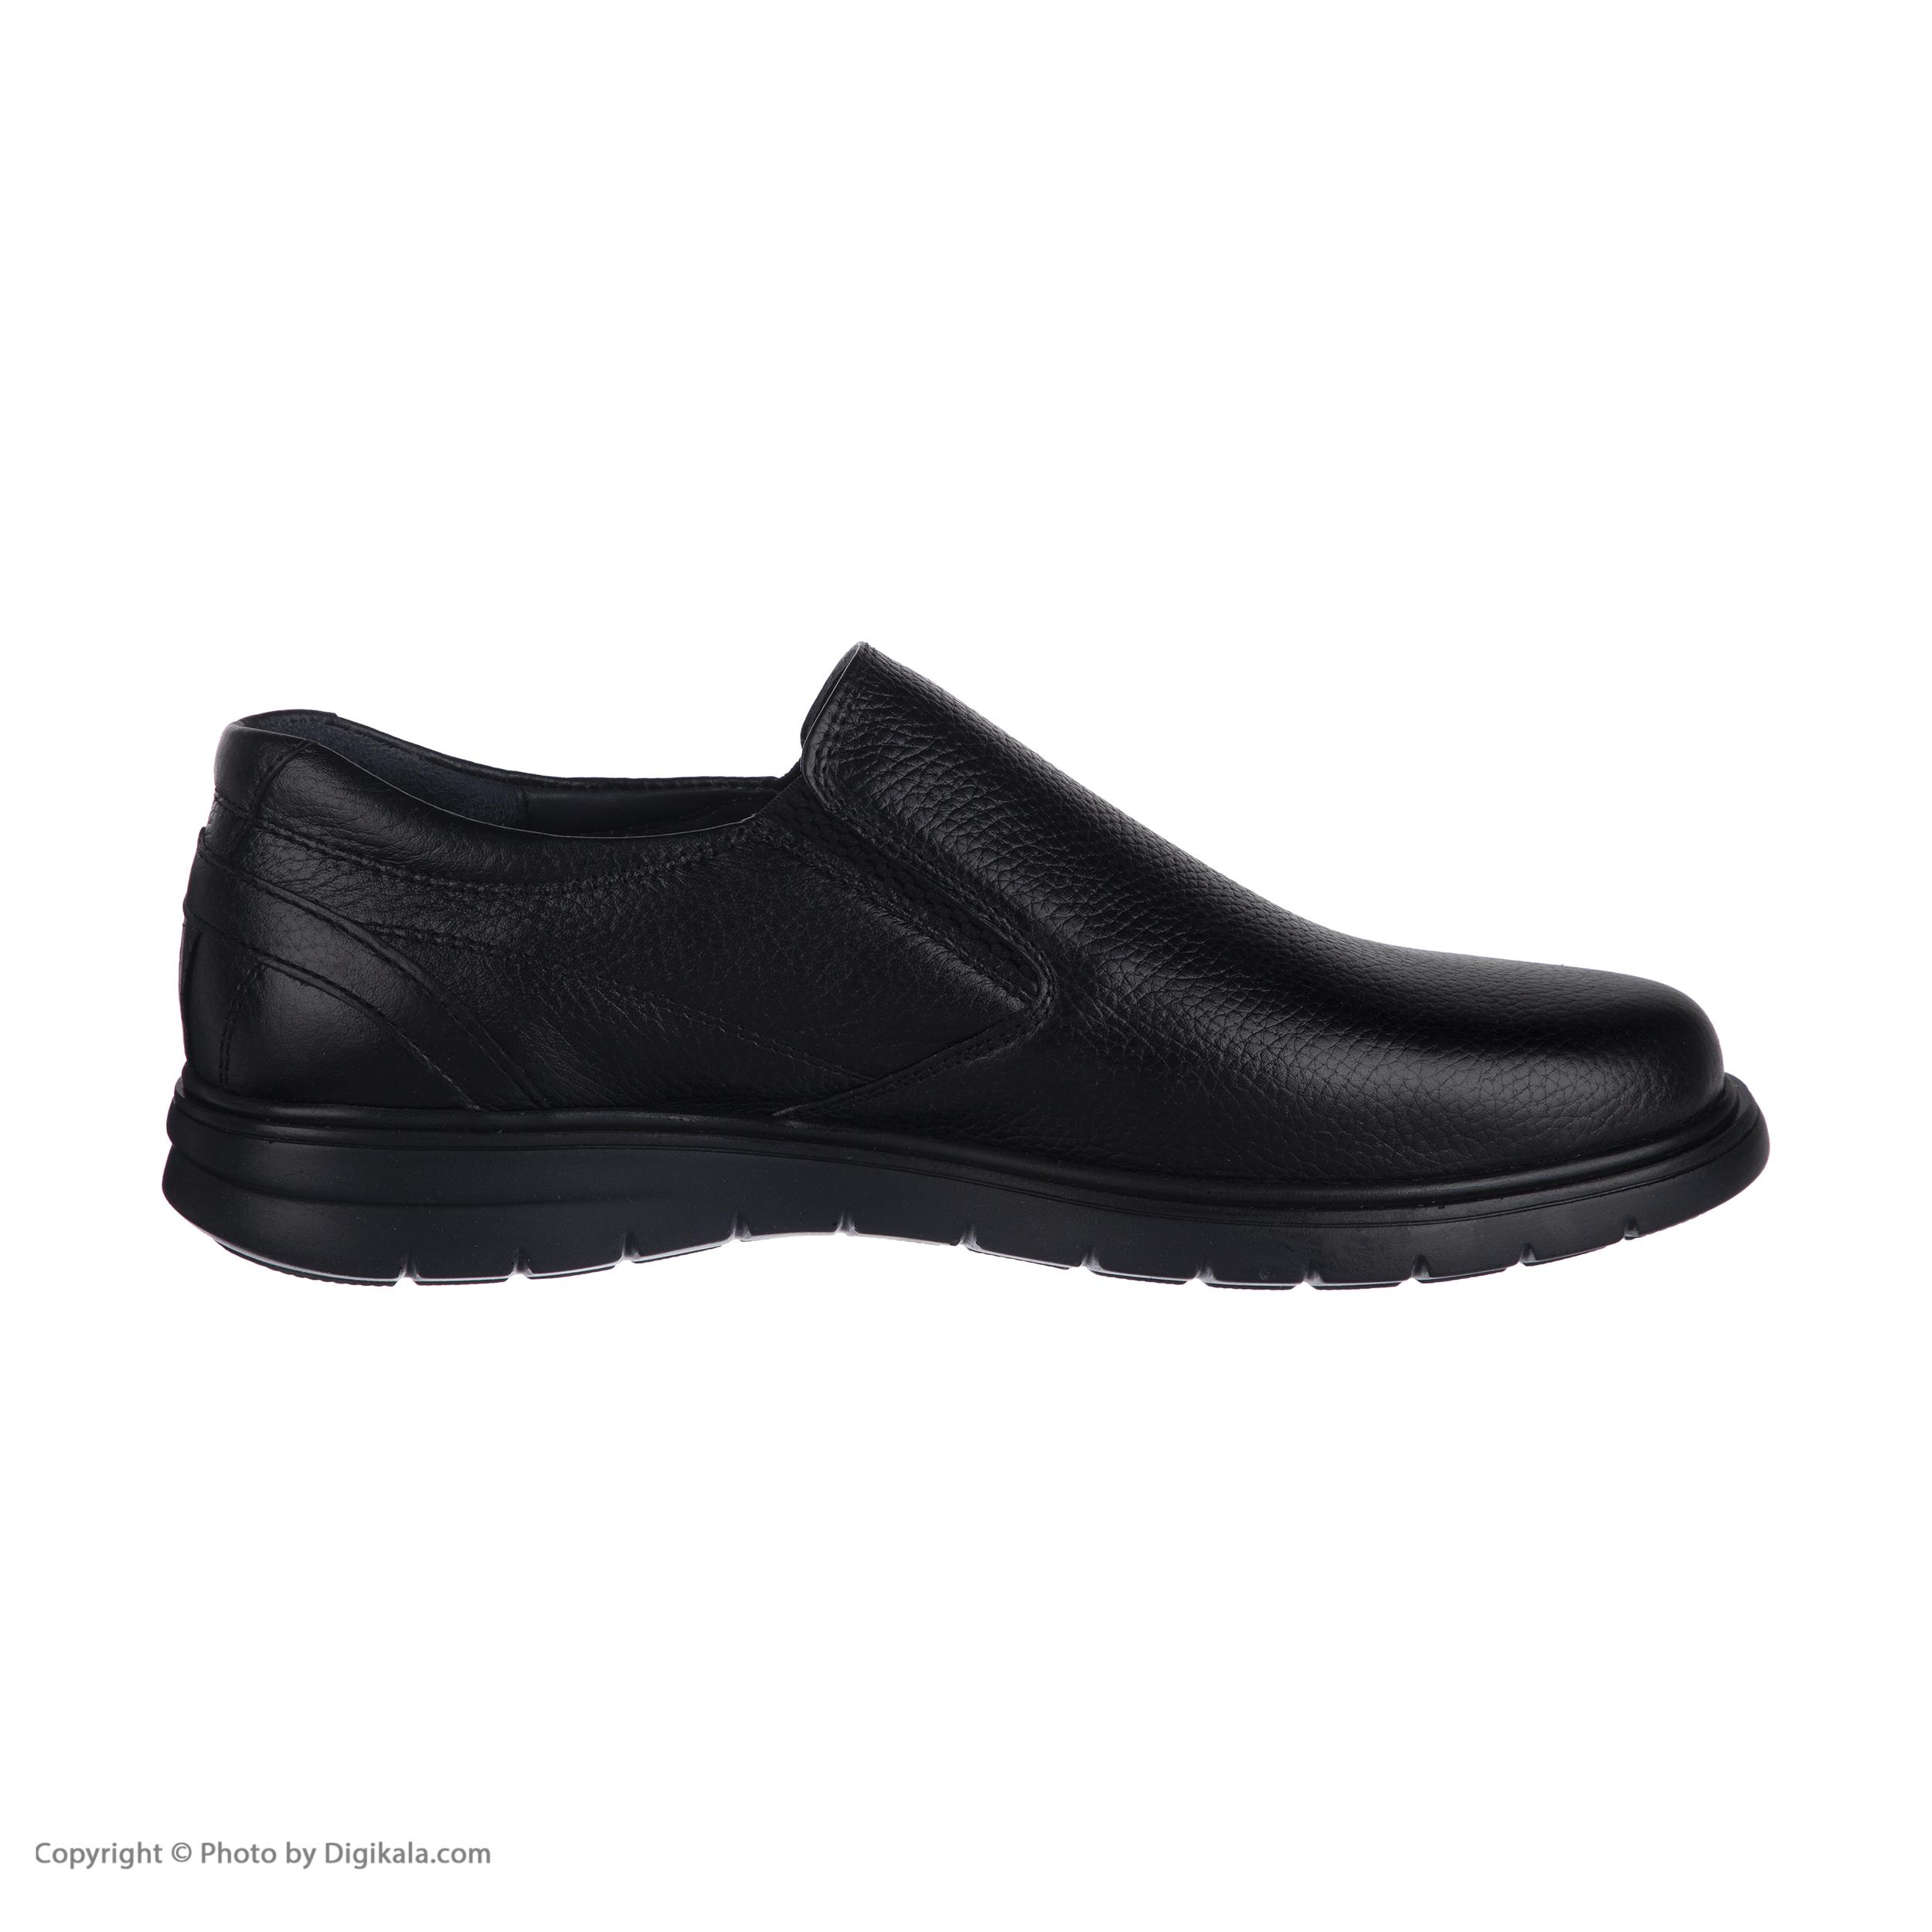 کفش روزمره مردانه دلفارد مدل 8334A503101 -  - 4